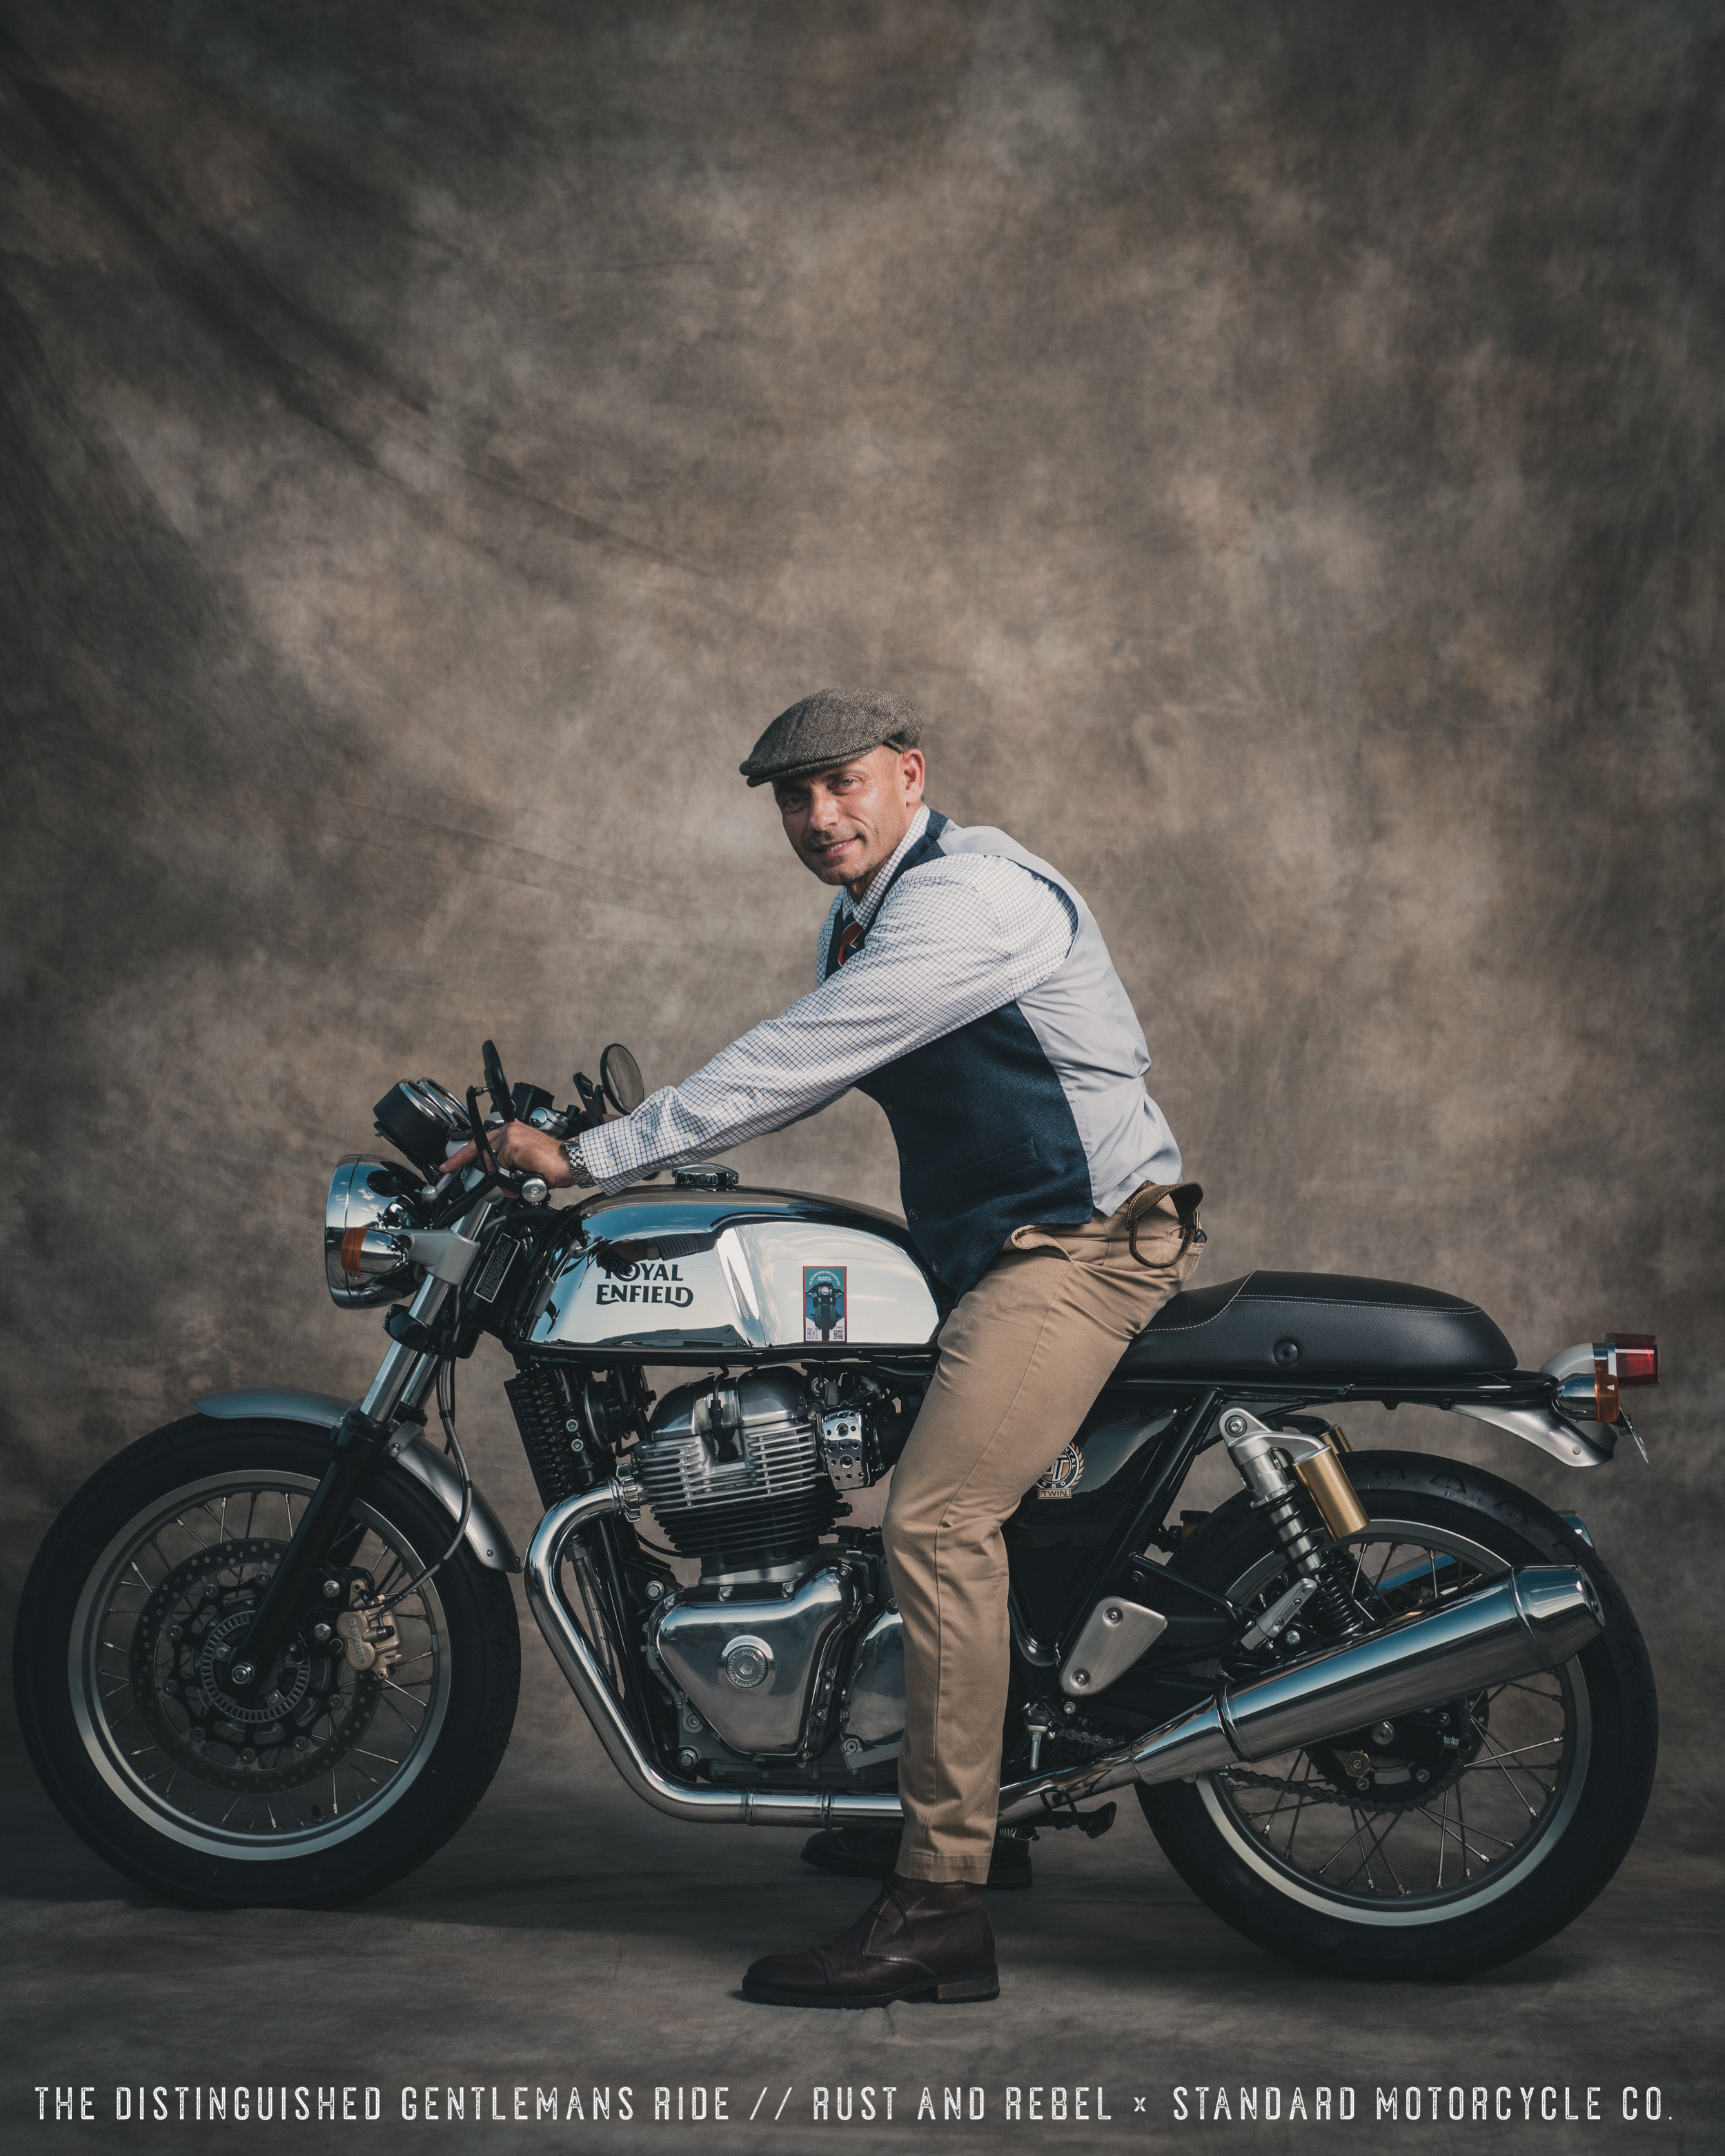 The Distinguished Gentleman's Ride 2019 [PEOPLE - PHOTO BY @MIKEDUNNUSA] - 0111.jpg